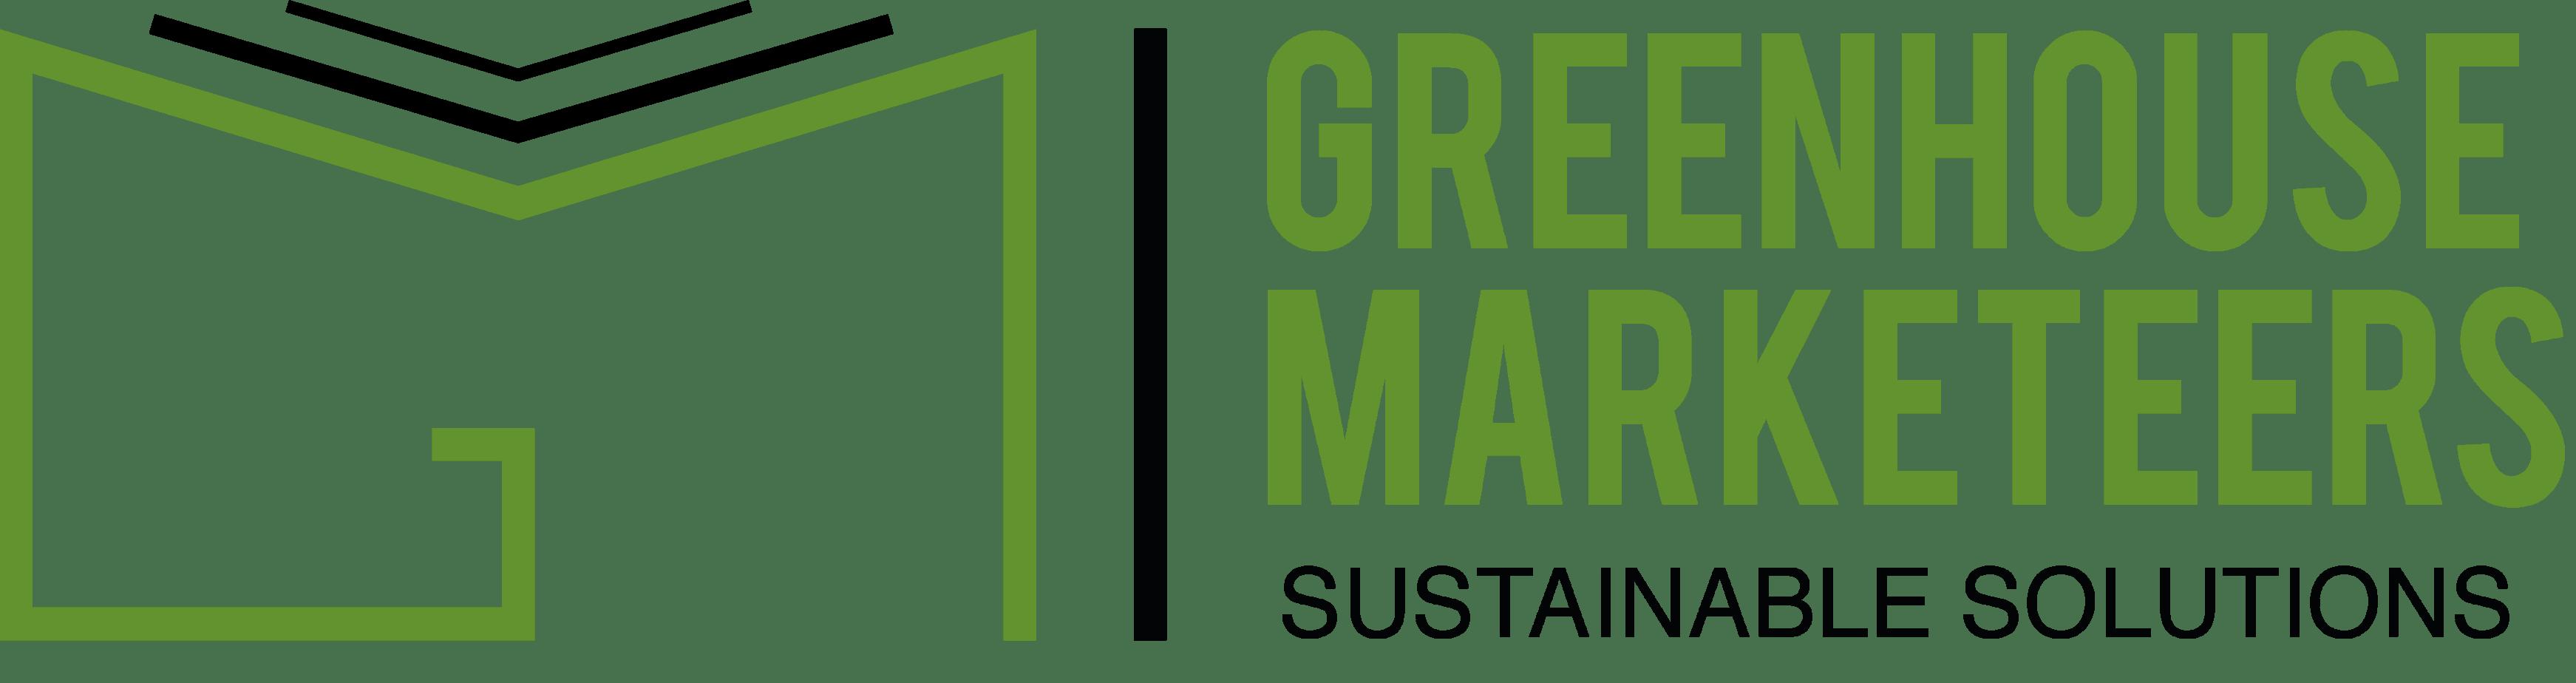 Greenhouse marketeers